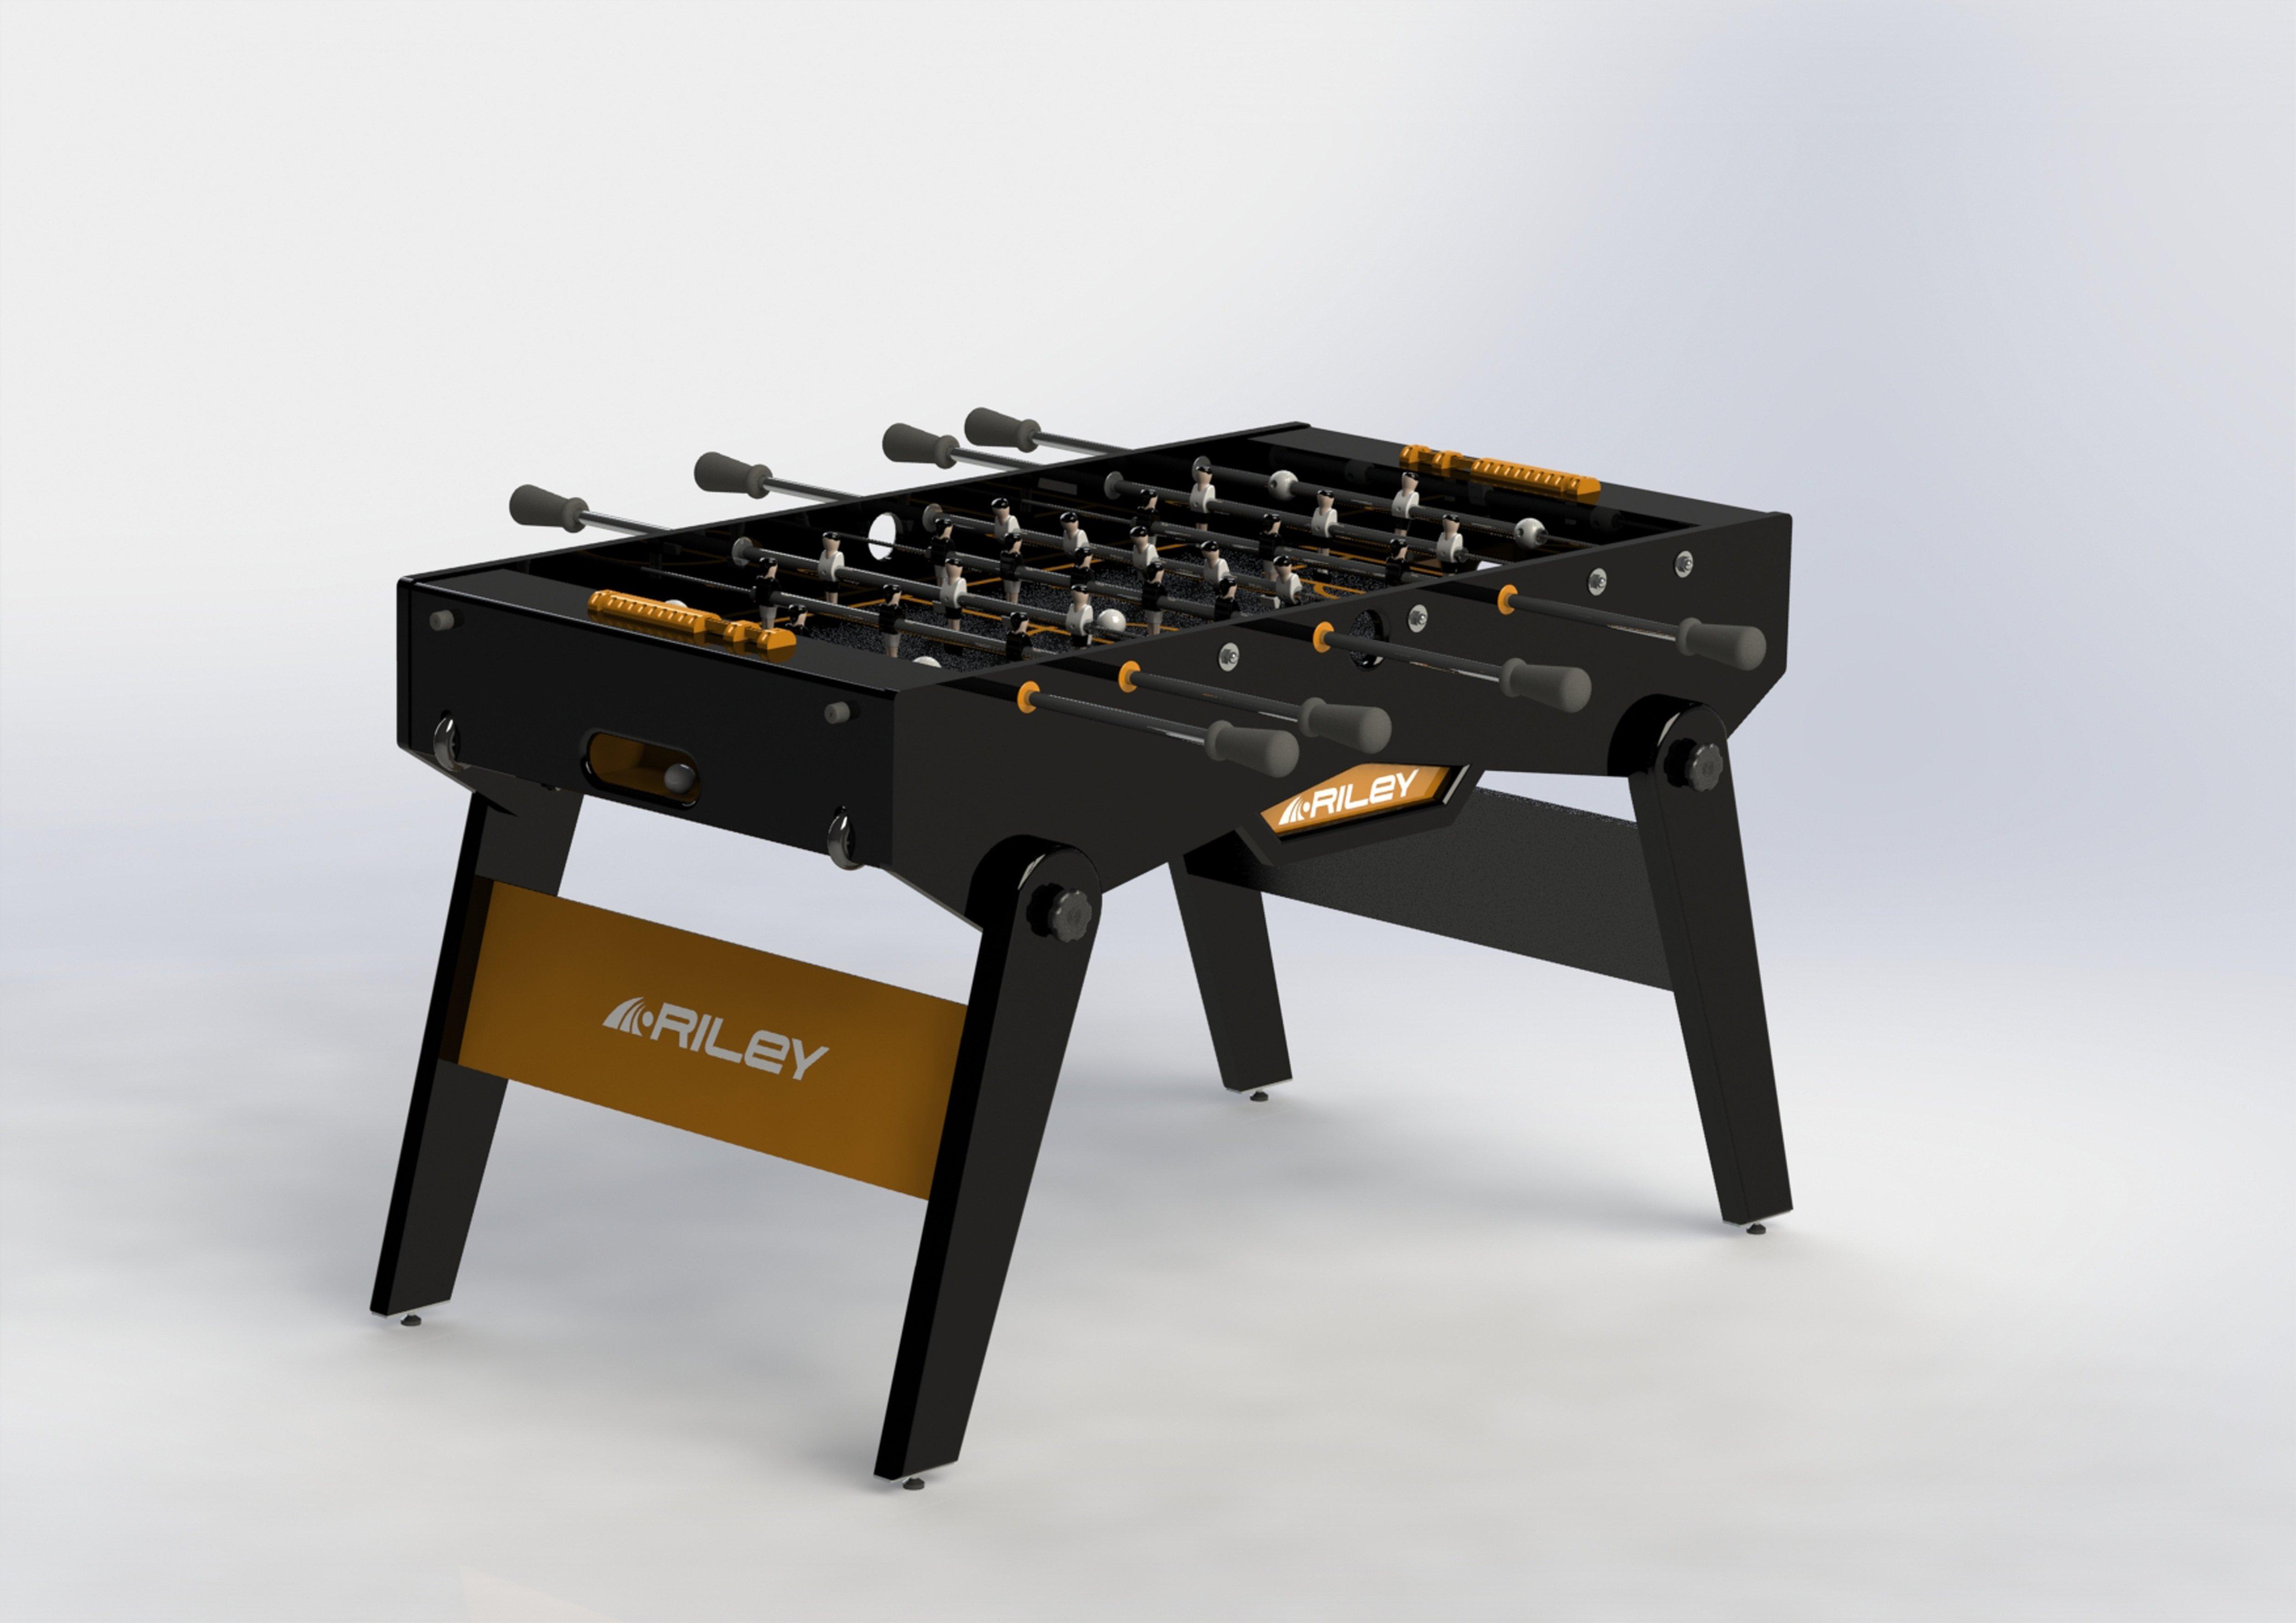 Riley 4`6 Folding Football Table